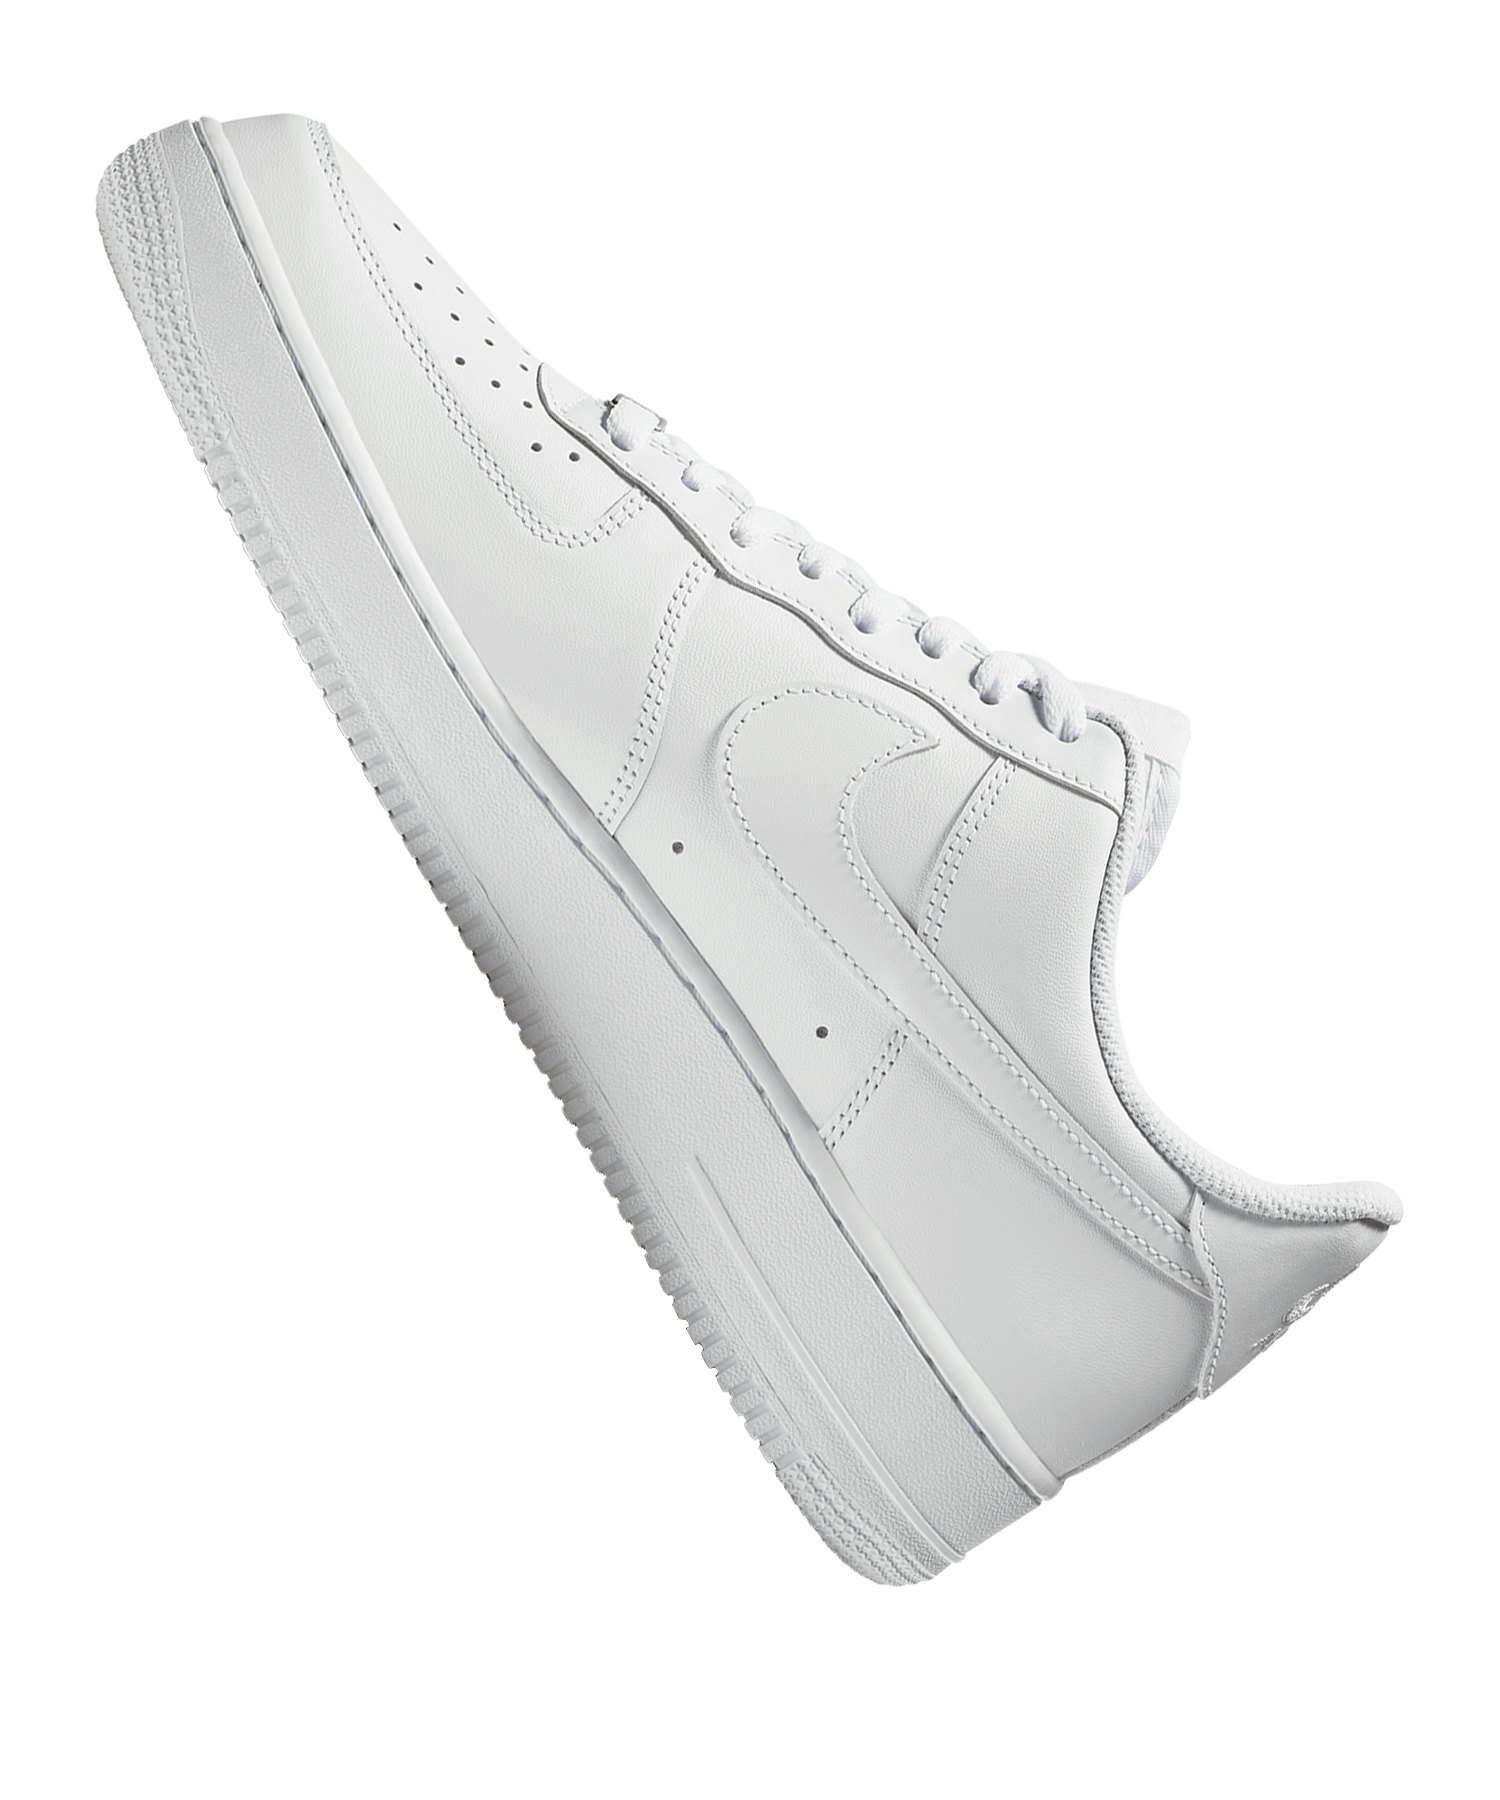 1 F111 Nike Force '07 Weiss Air Sneaker lK1TcFJ